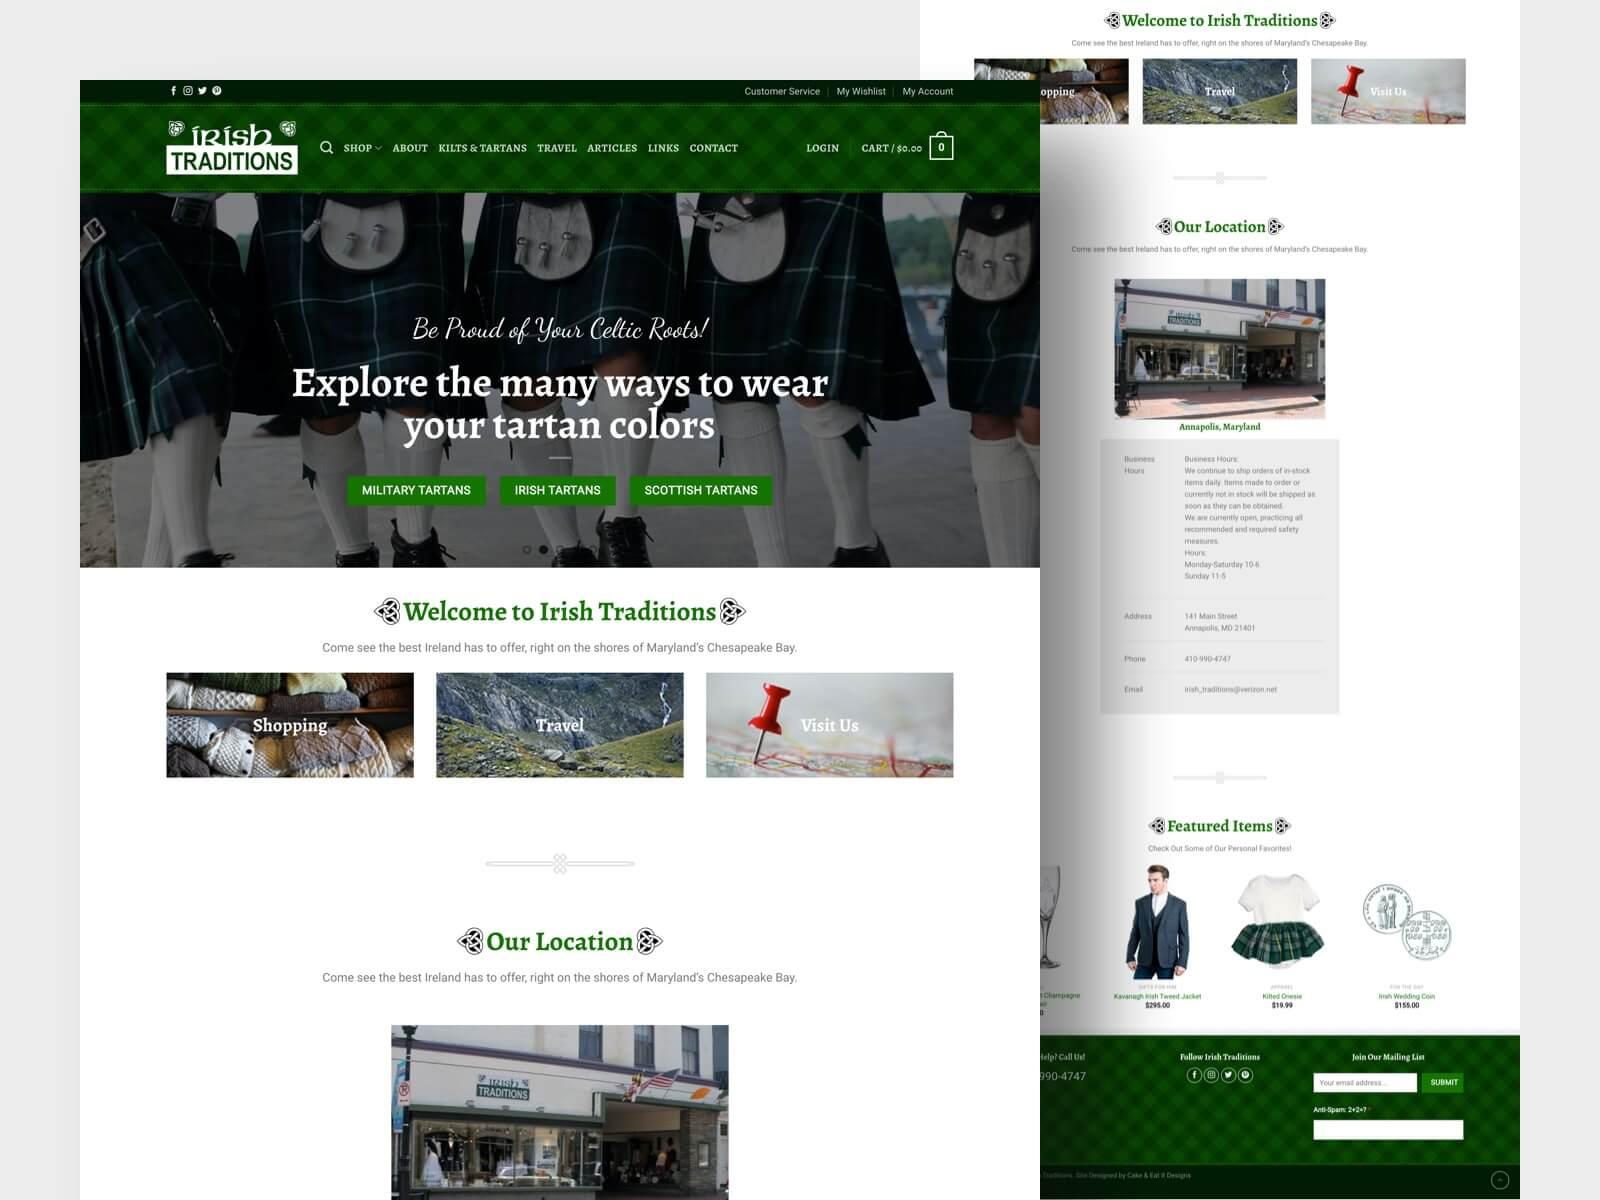 irish-traditions-homepage@2x